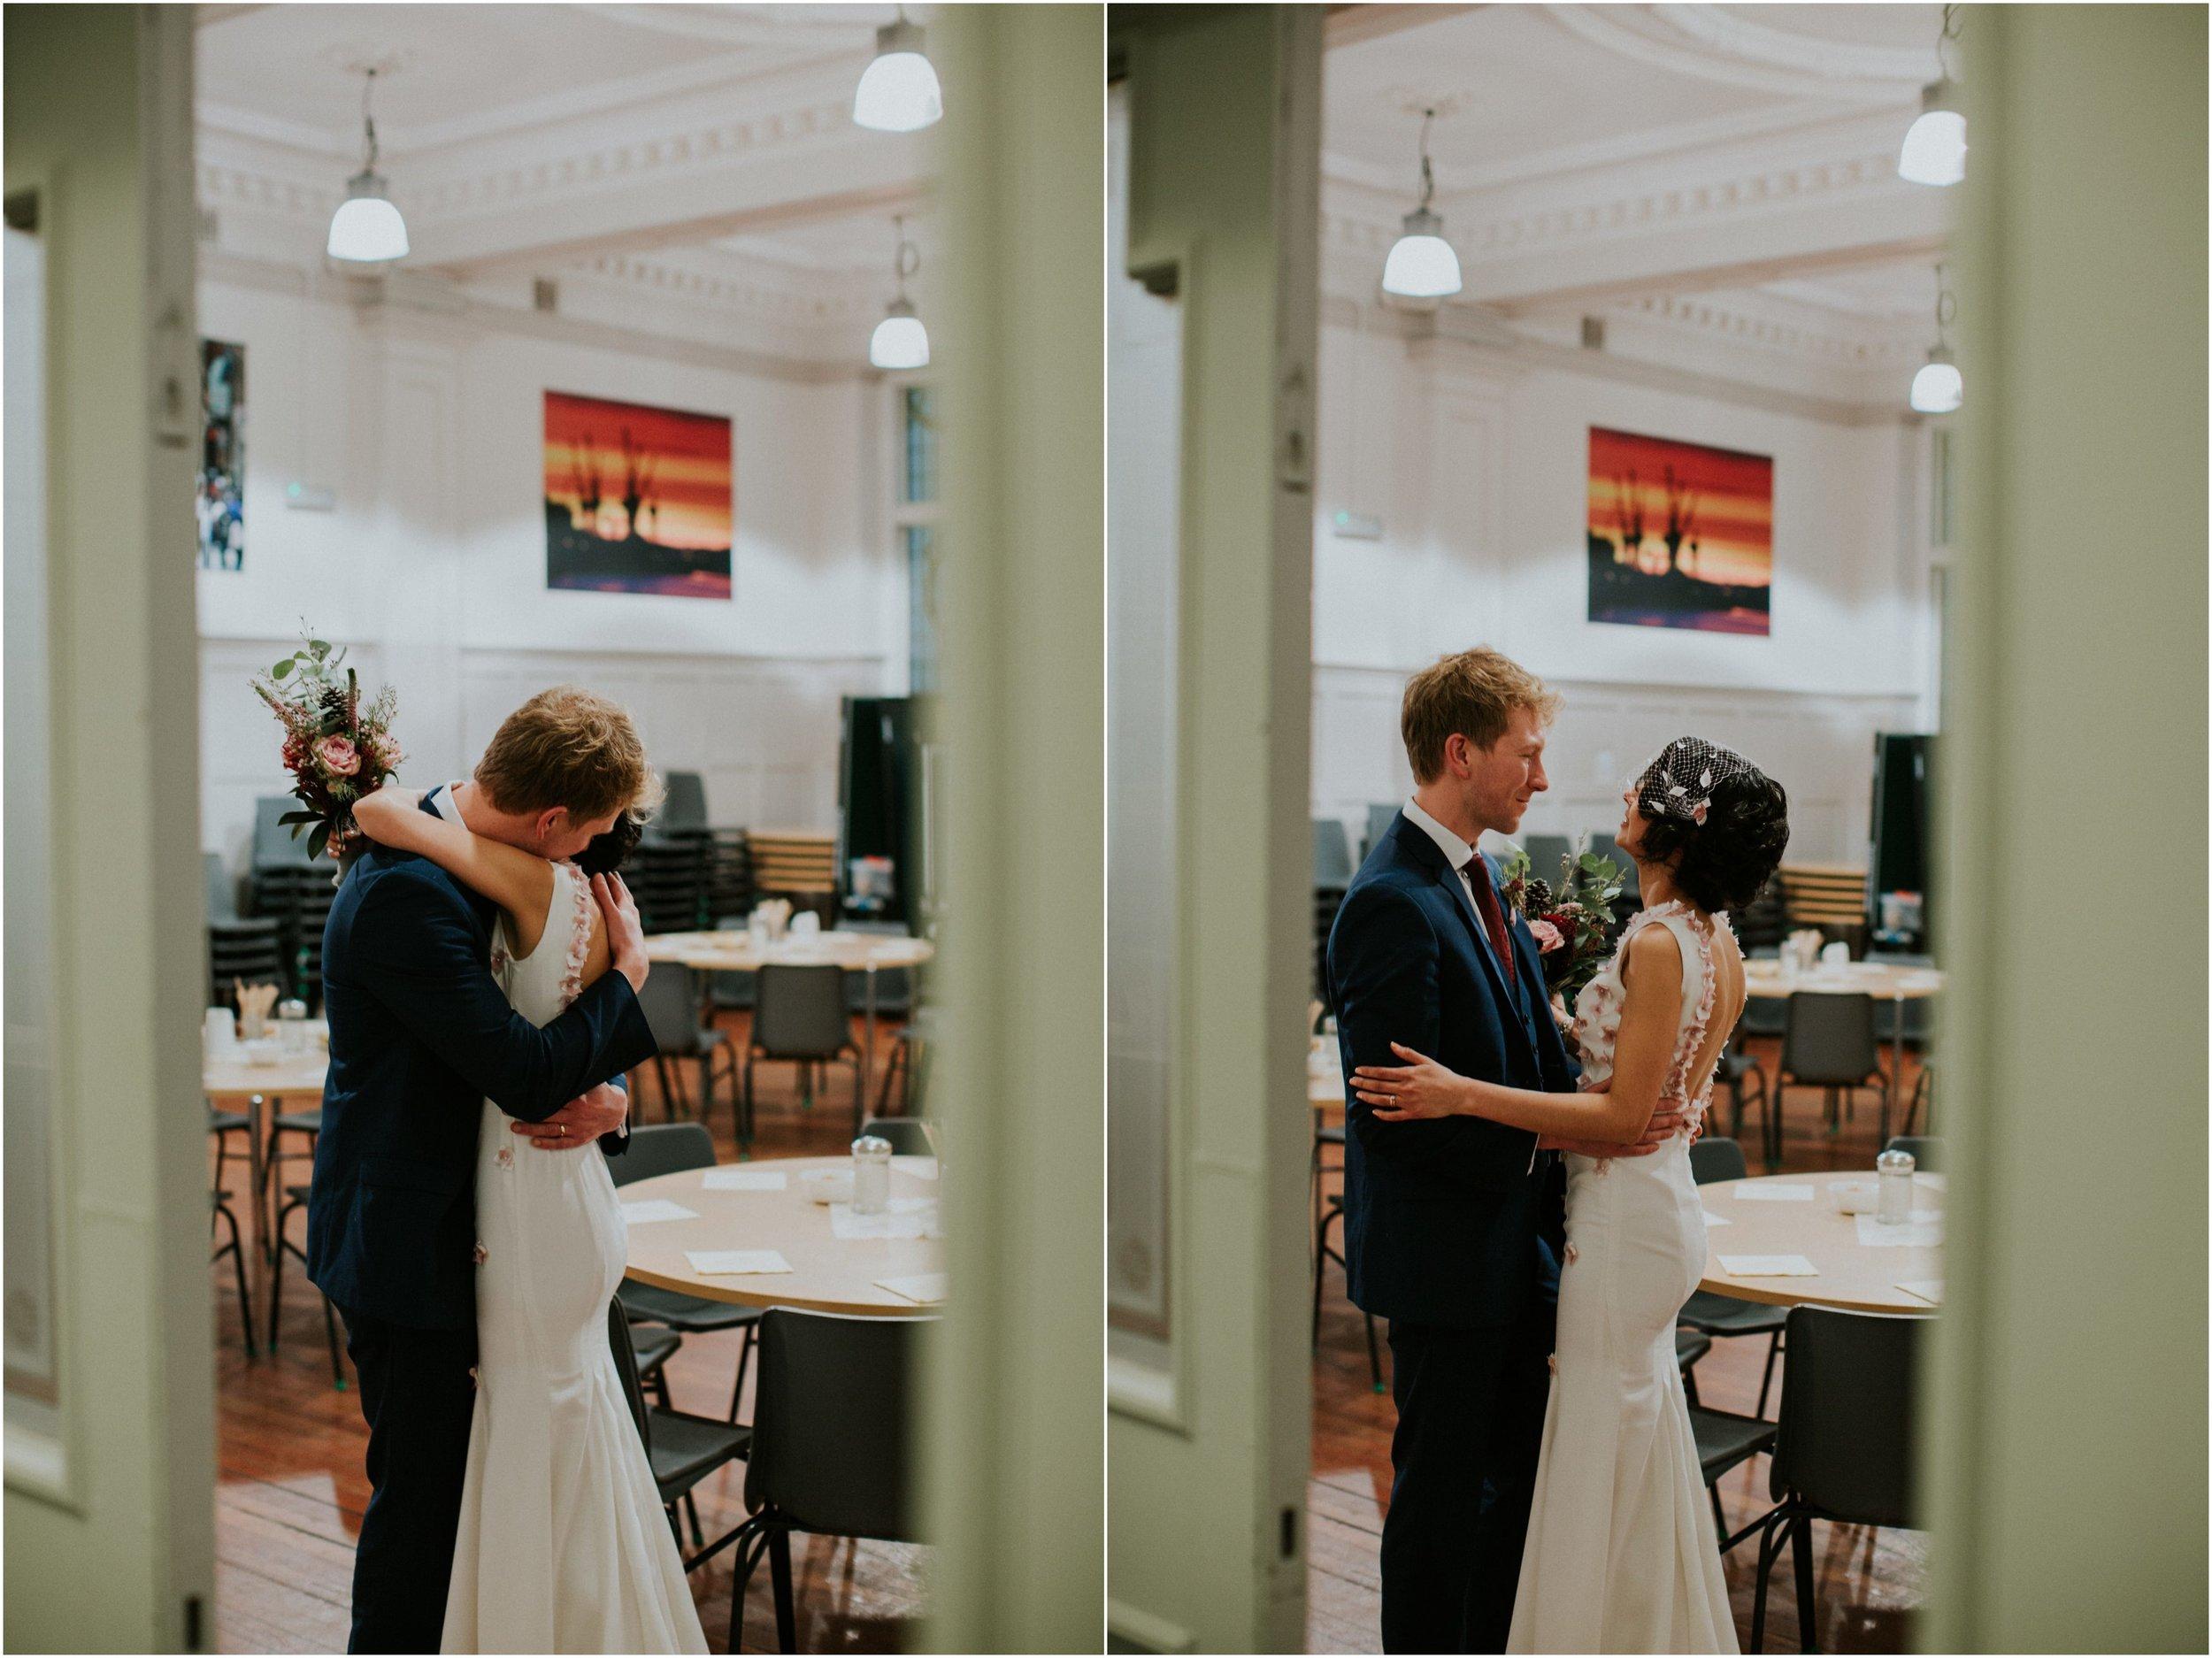 Photography 78 - Glasgow Wedding Photographer - Year in Reveiw_0129.jpg